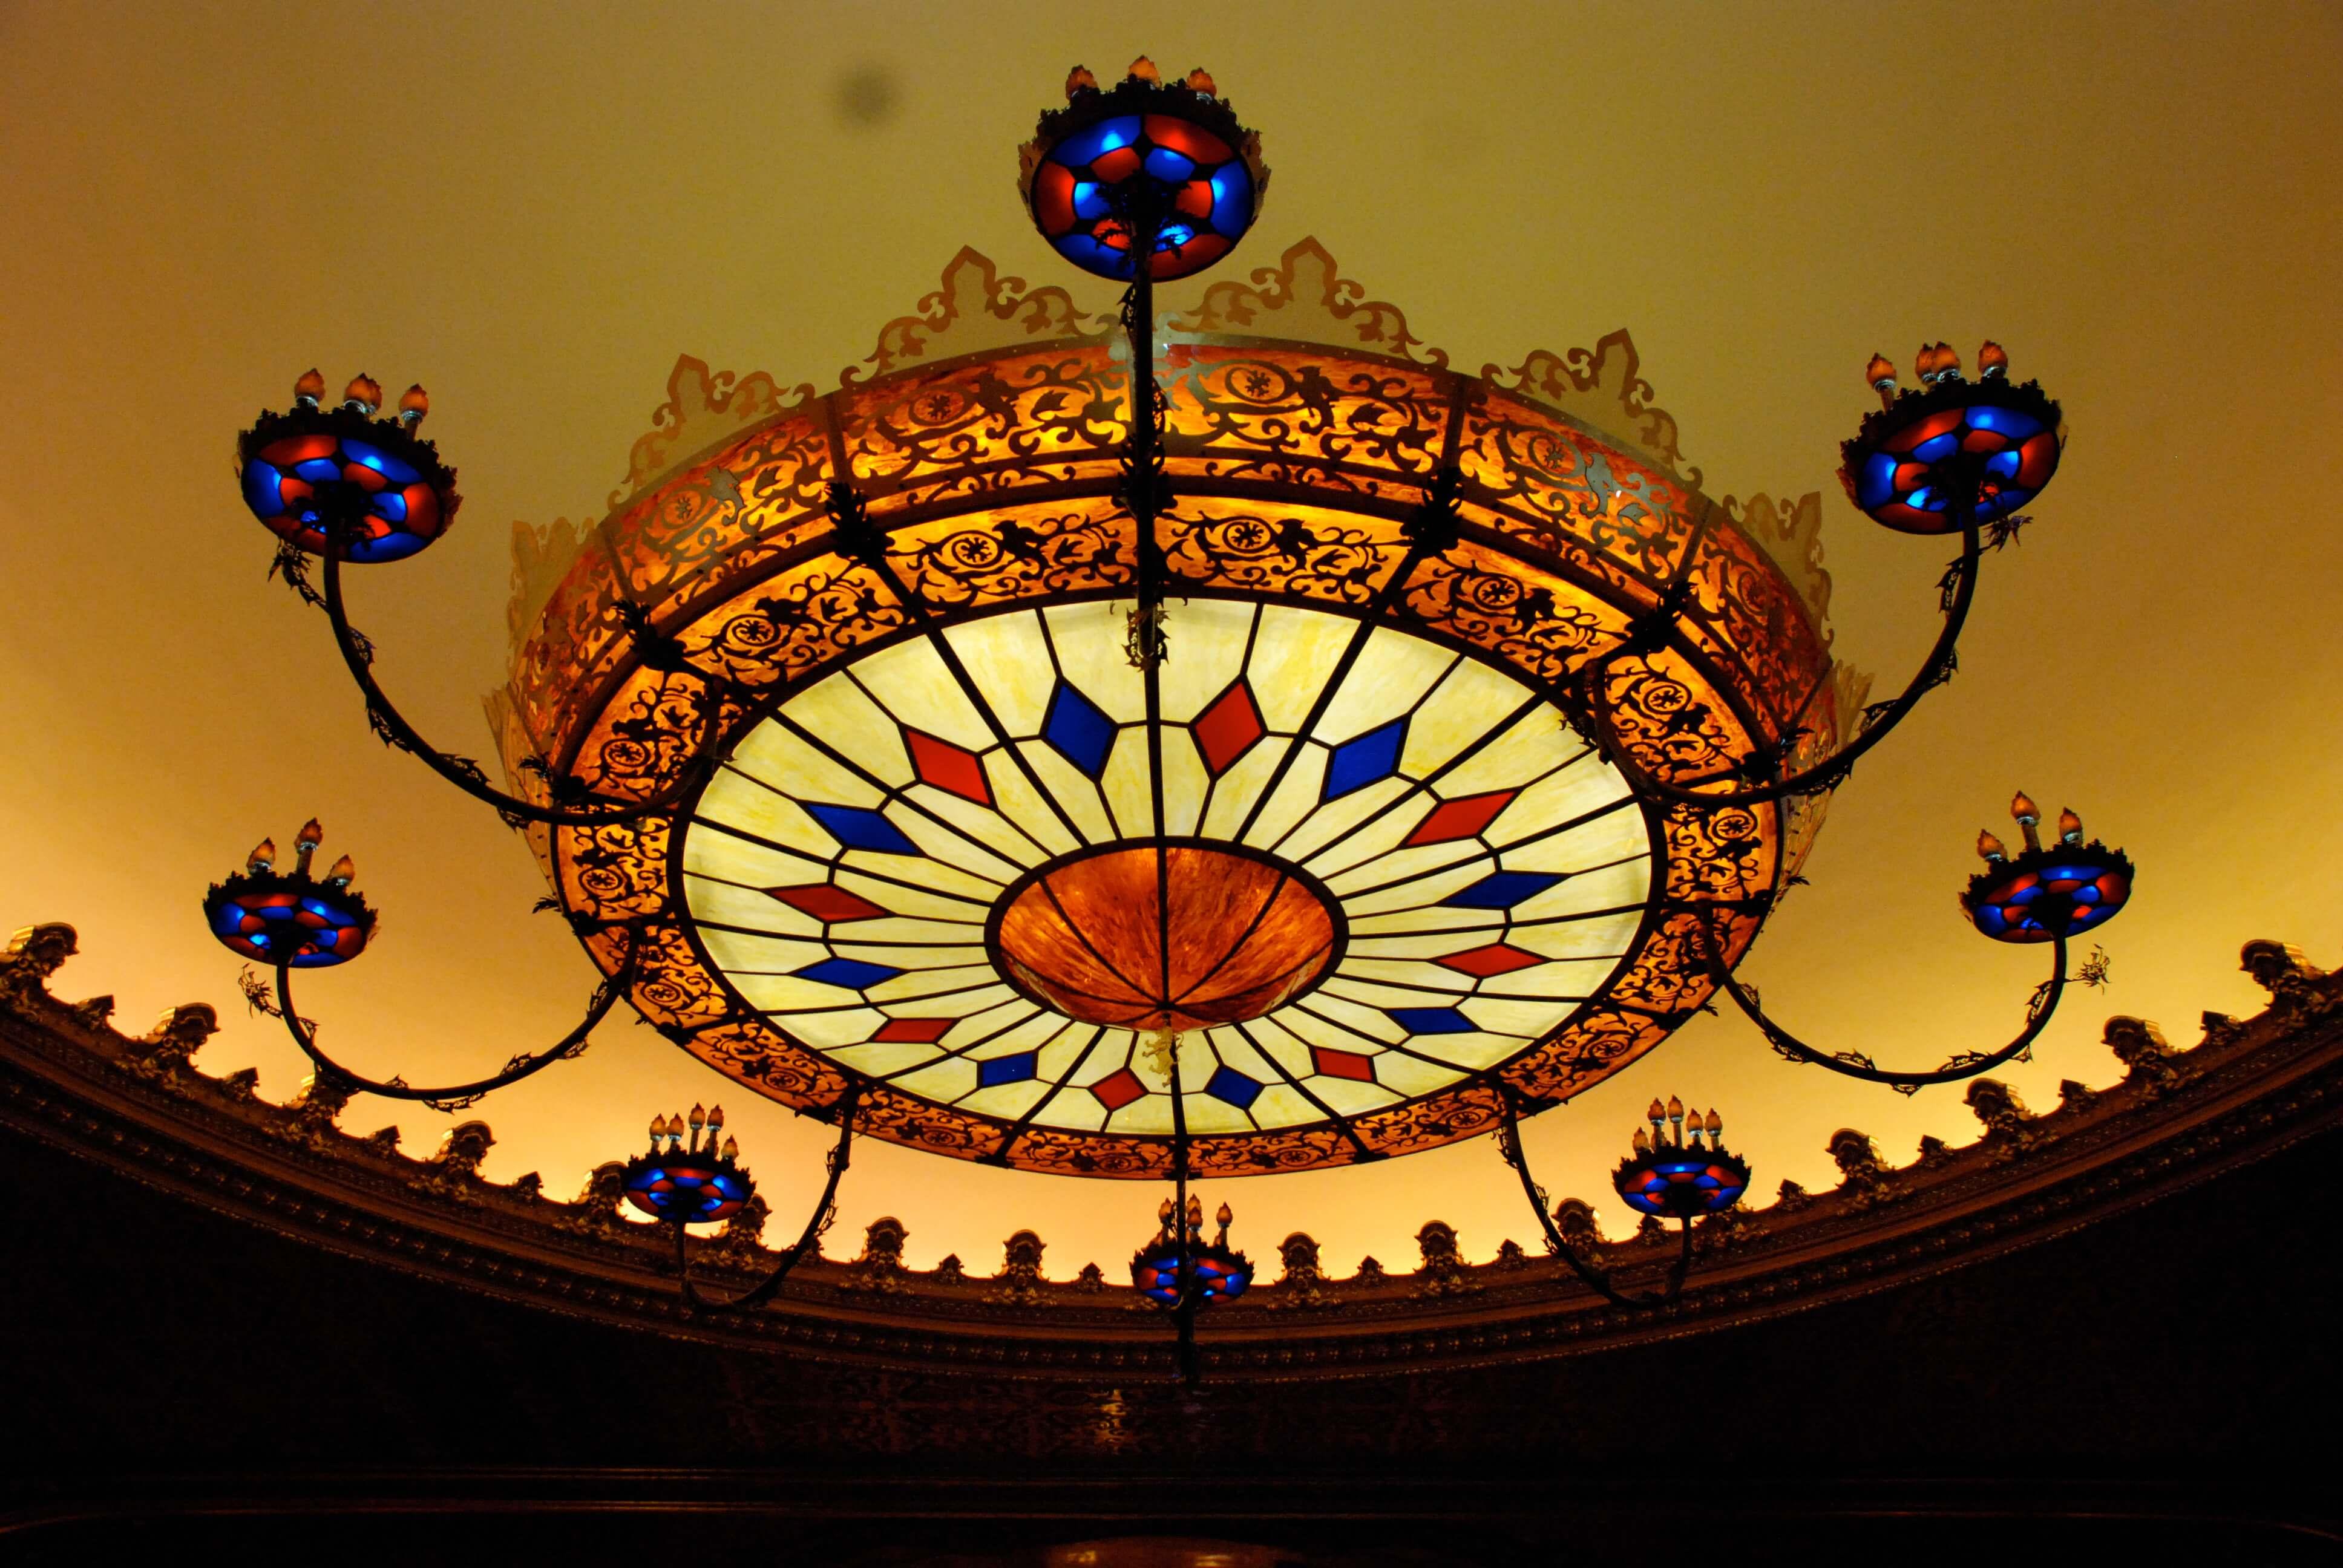 The Stanley Theatre chandelier